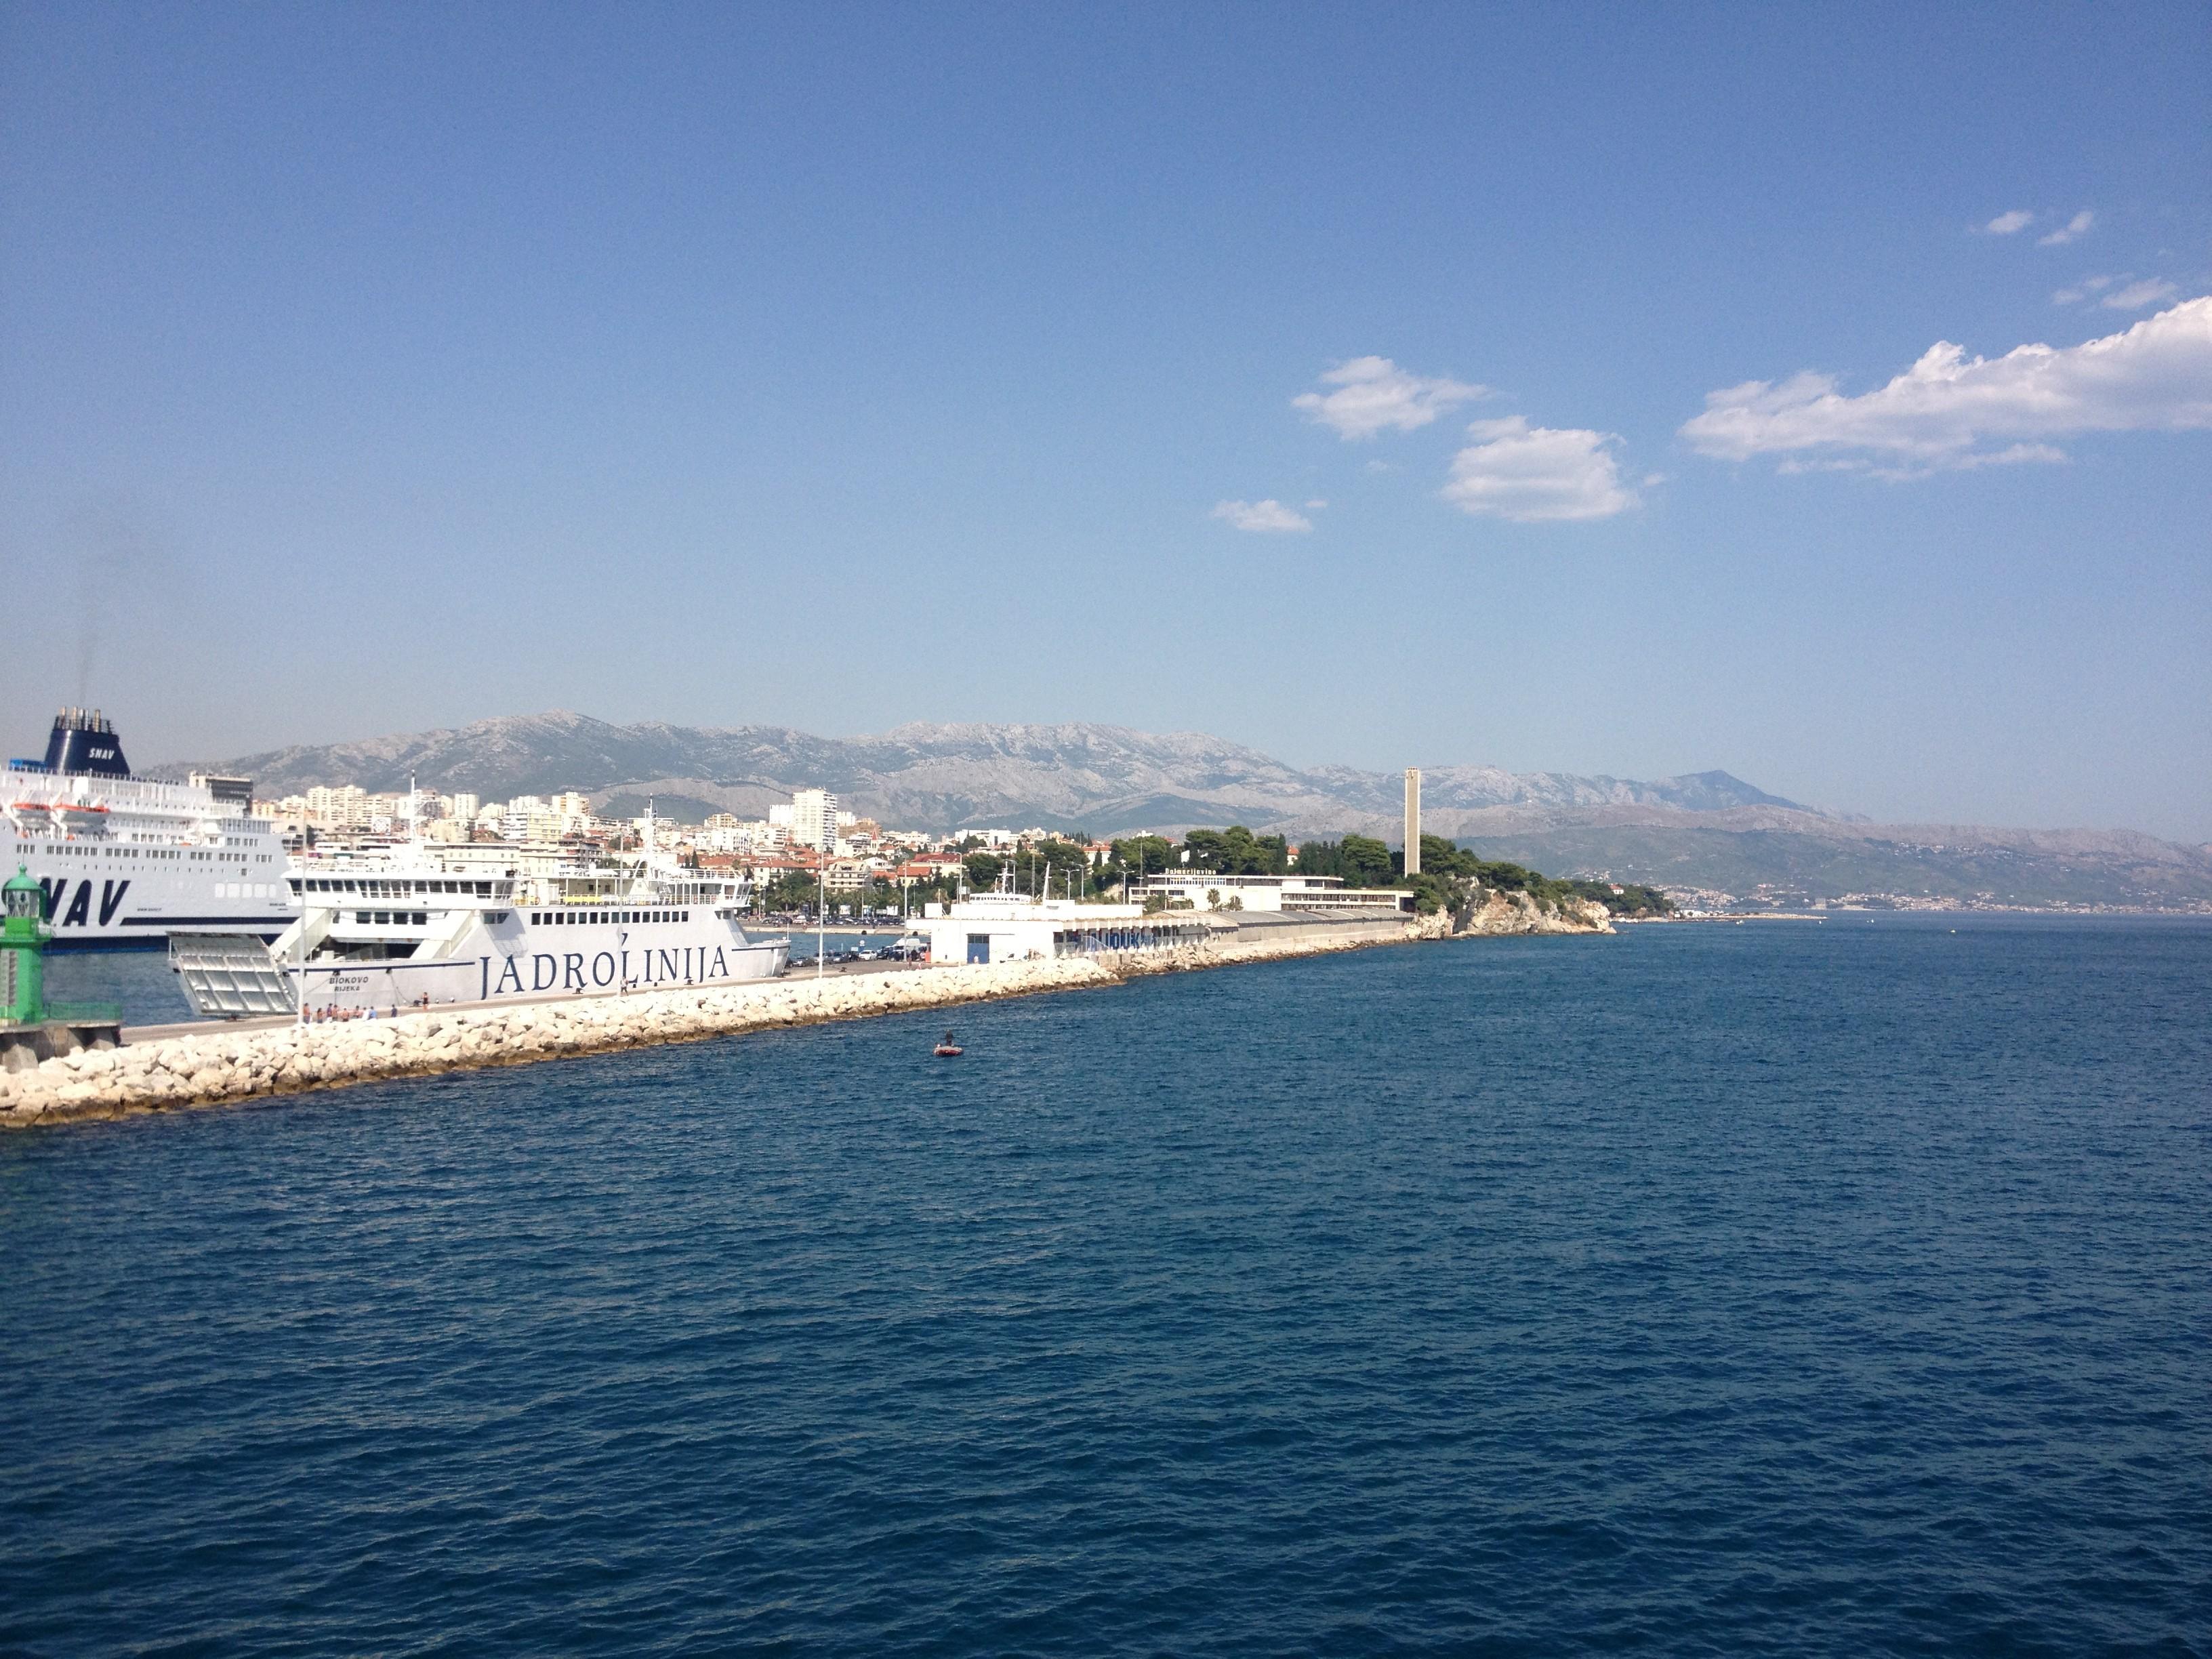 coastline pictures